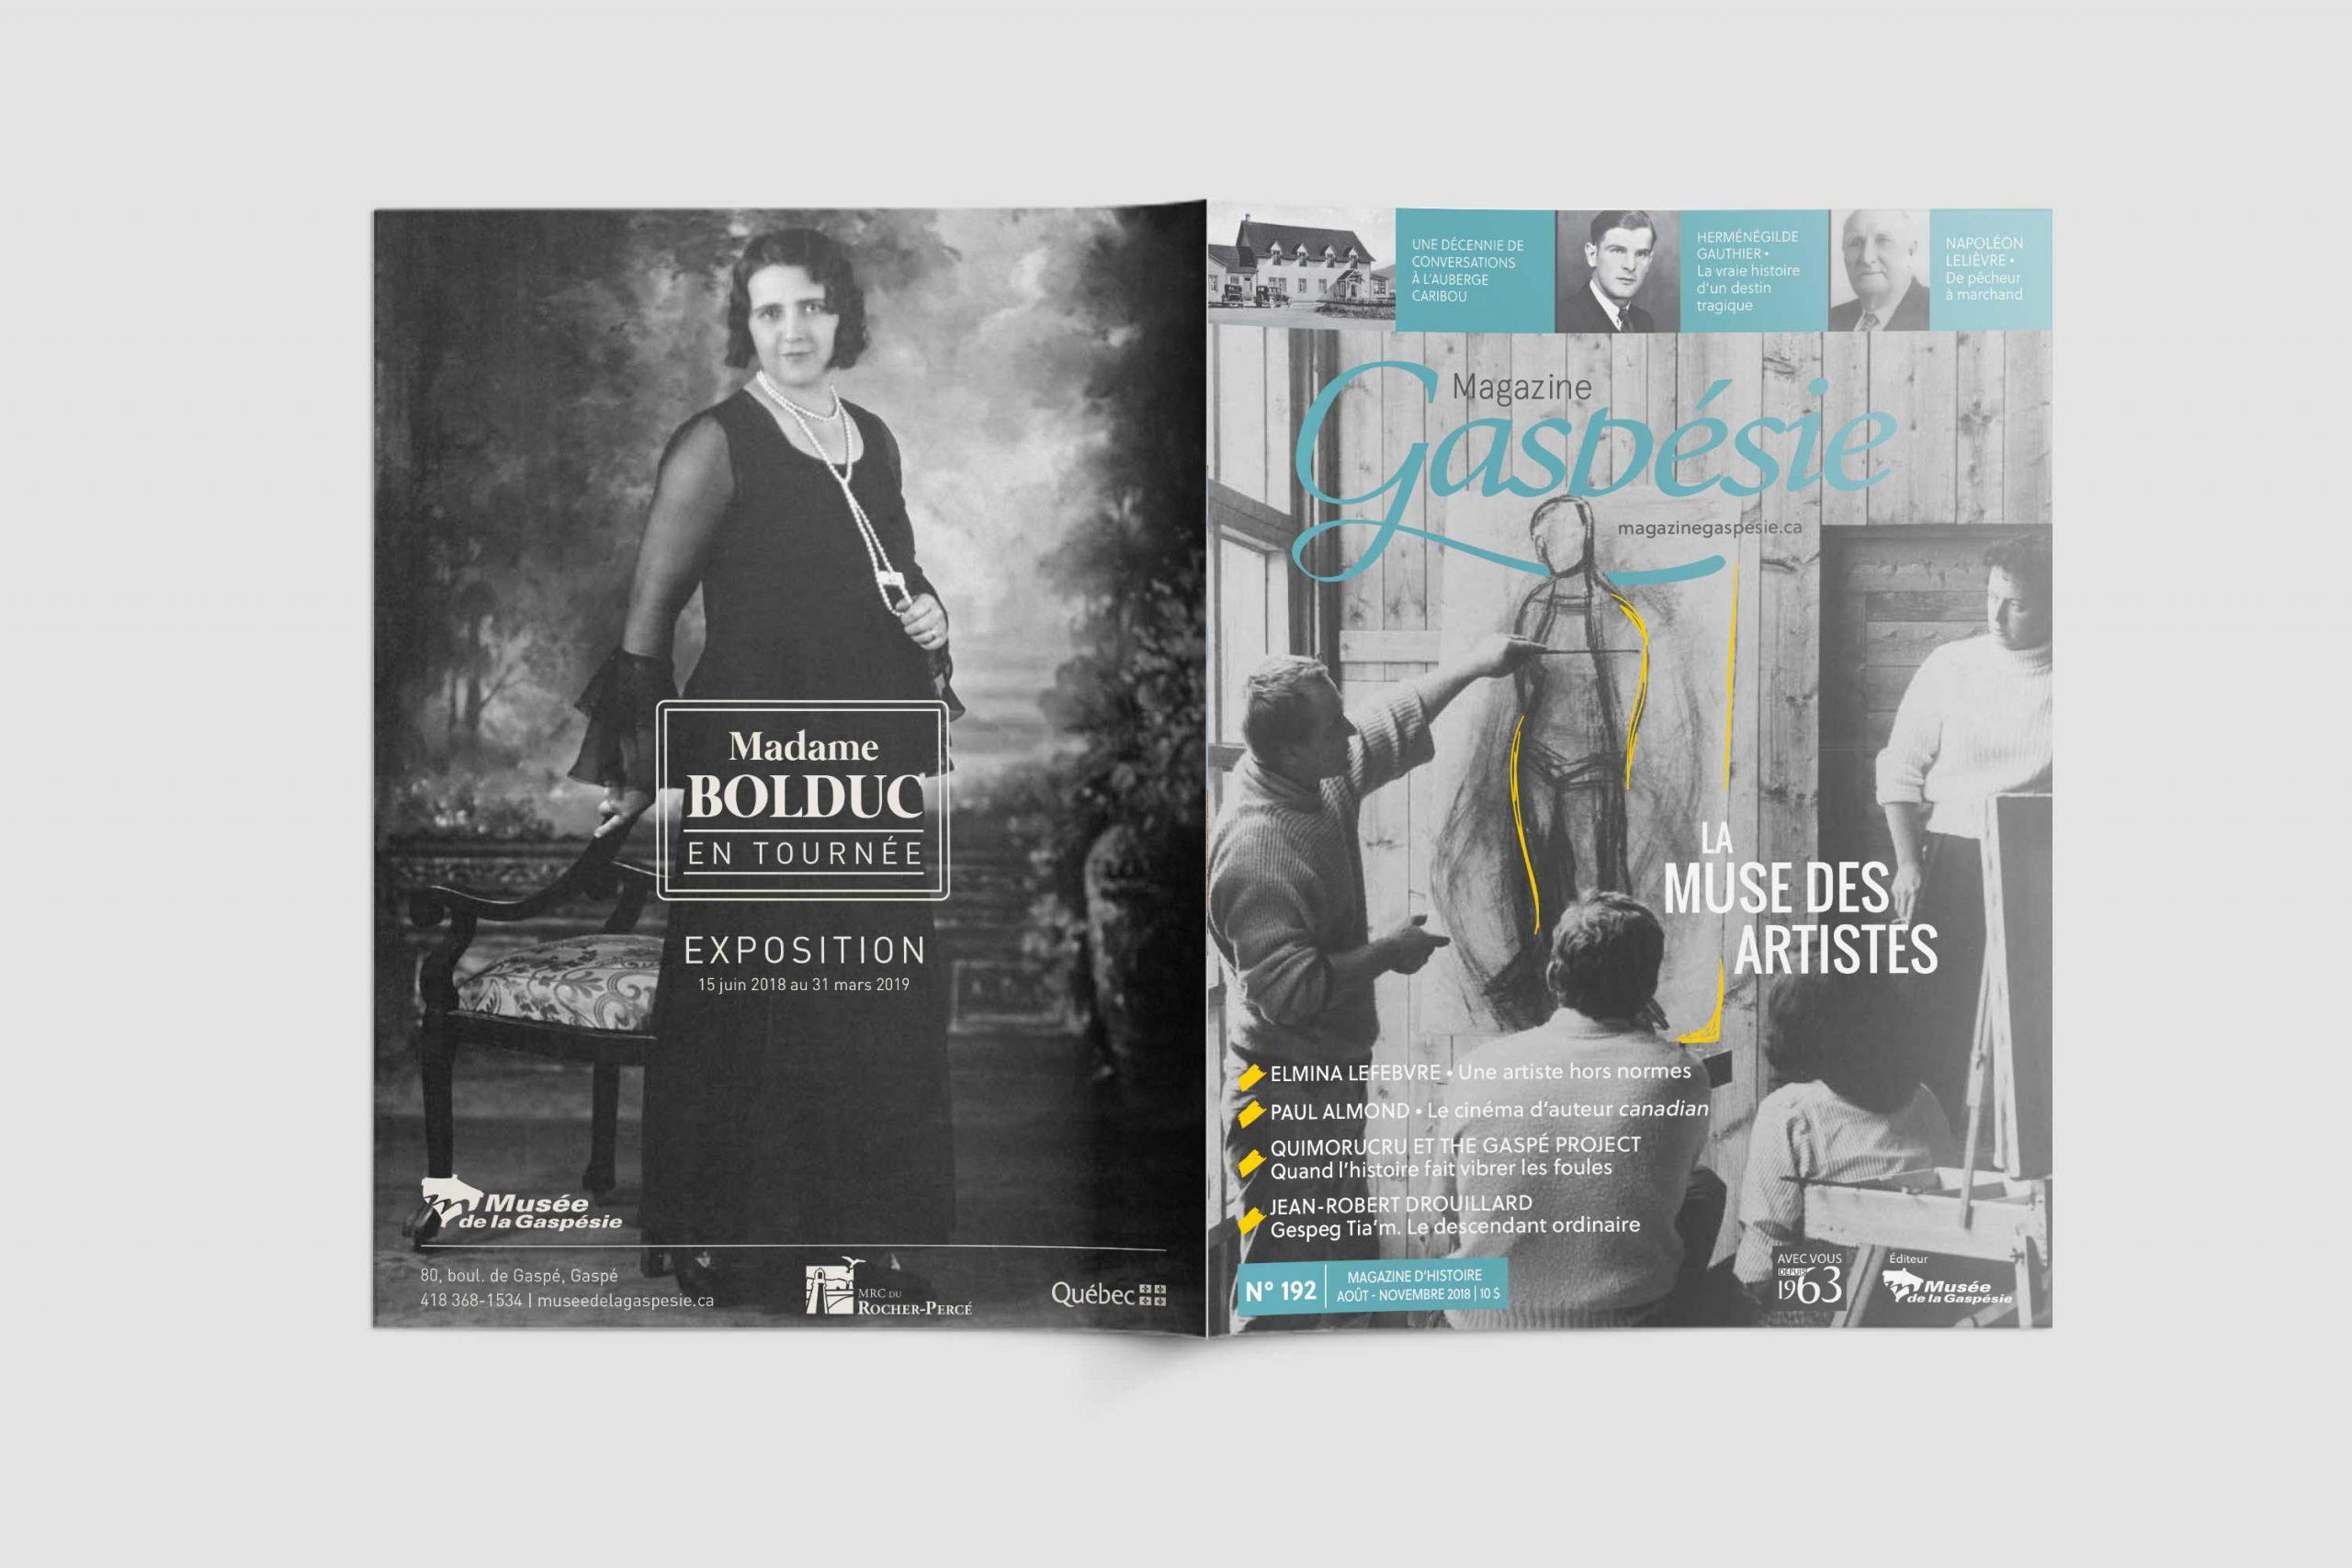 Mailys_ORY-Graphiste_Edition_Magazine-Gaspesie4